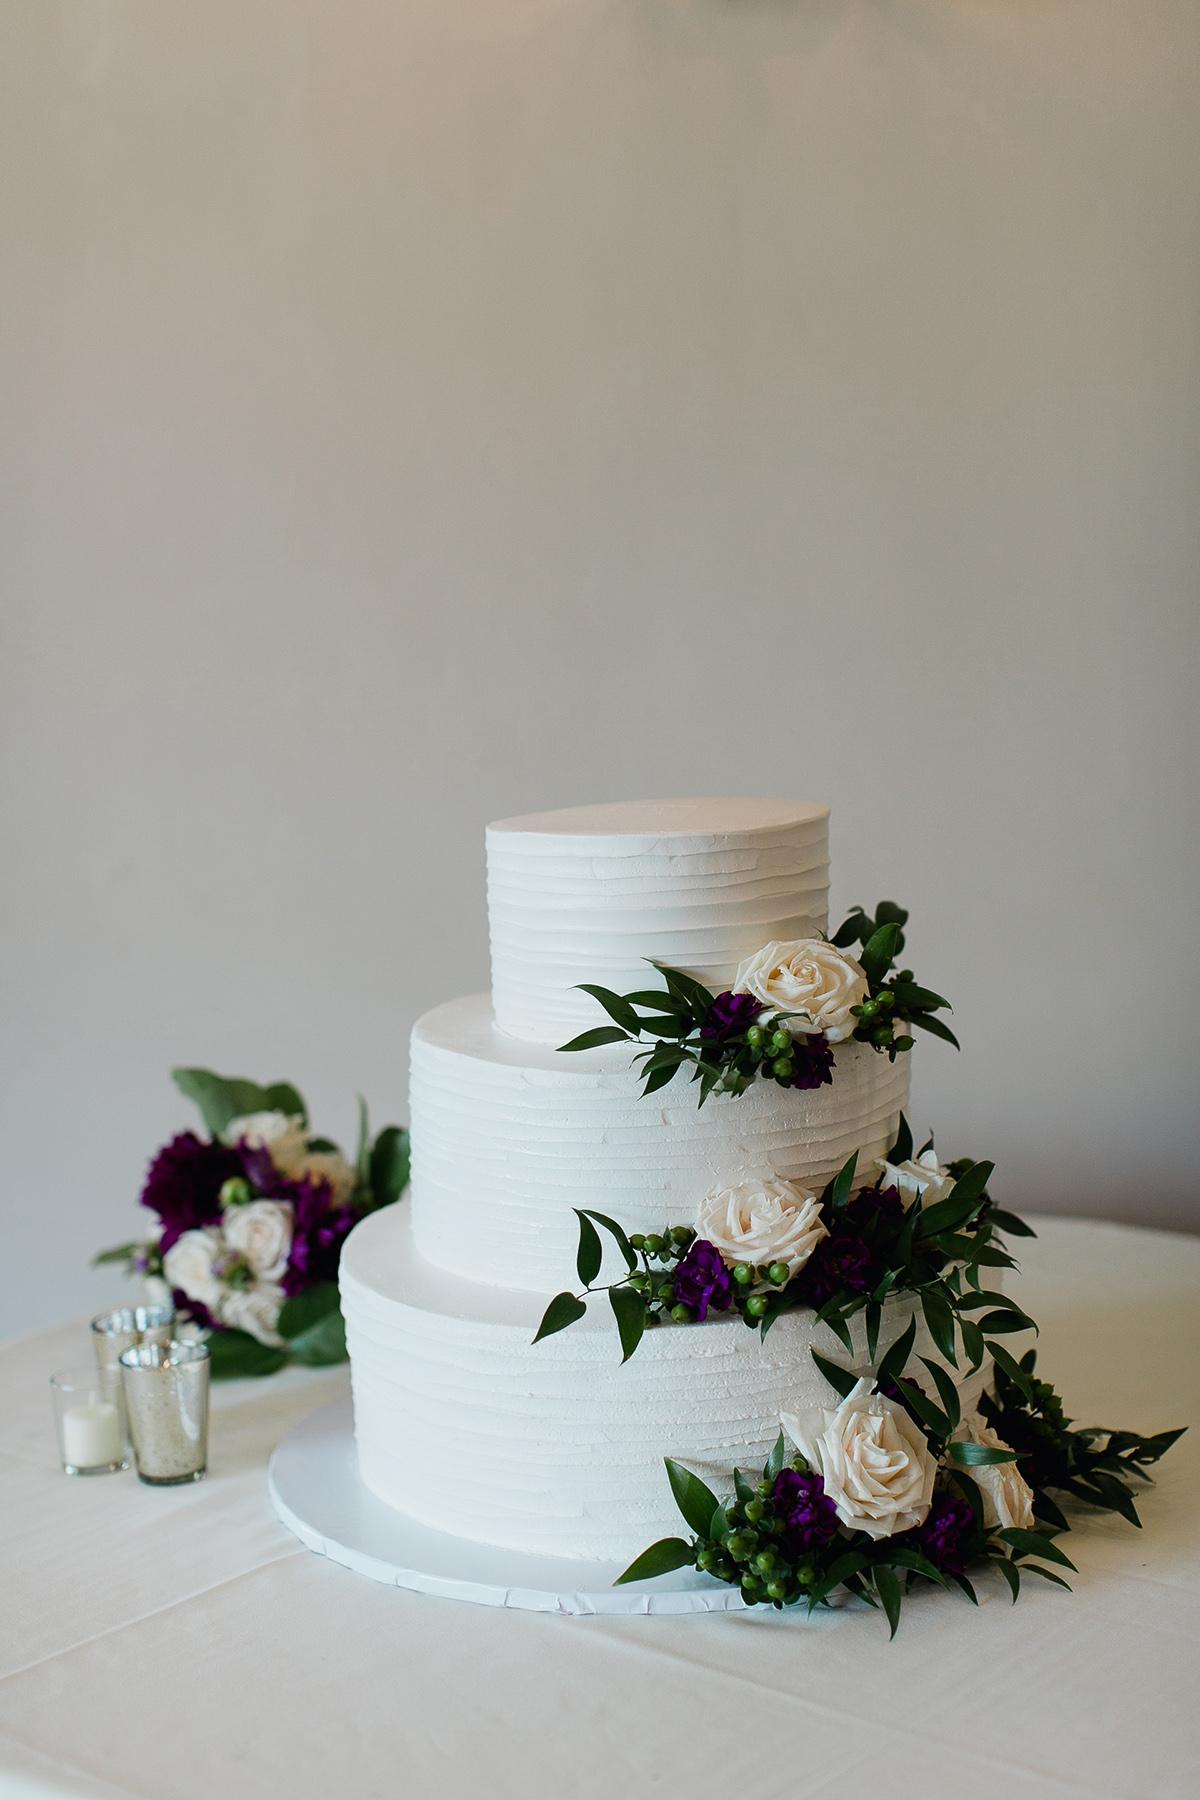 marla_david_wedding_064.jpg